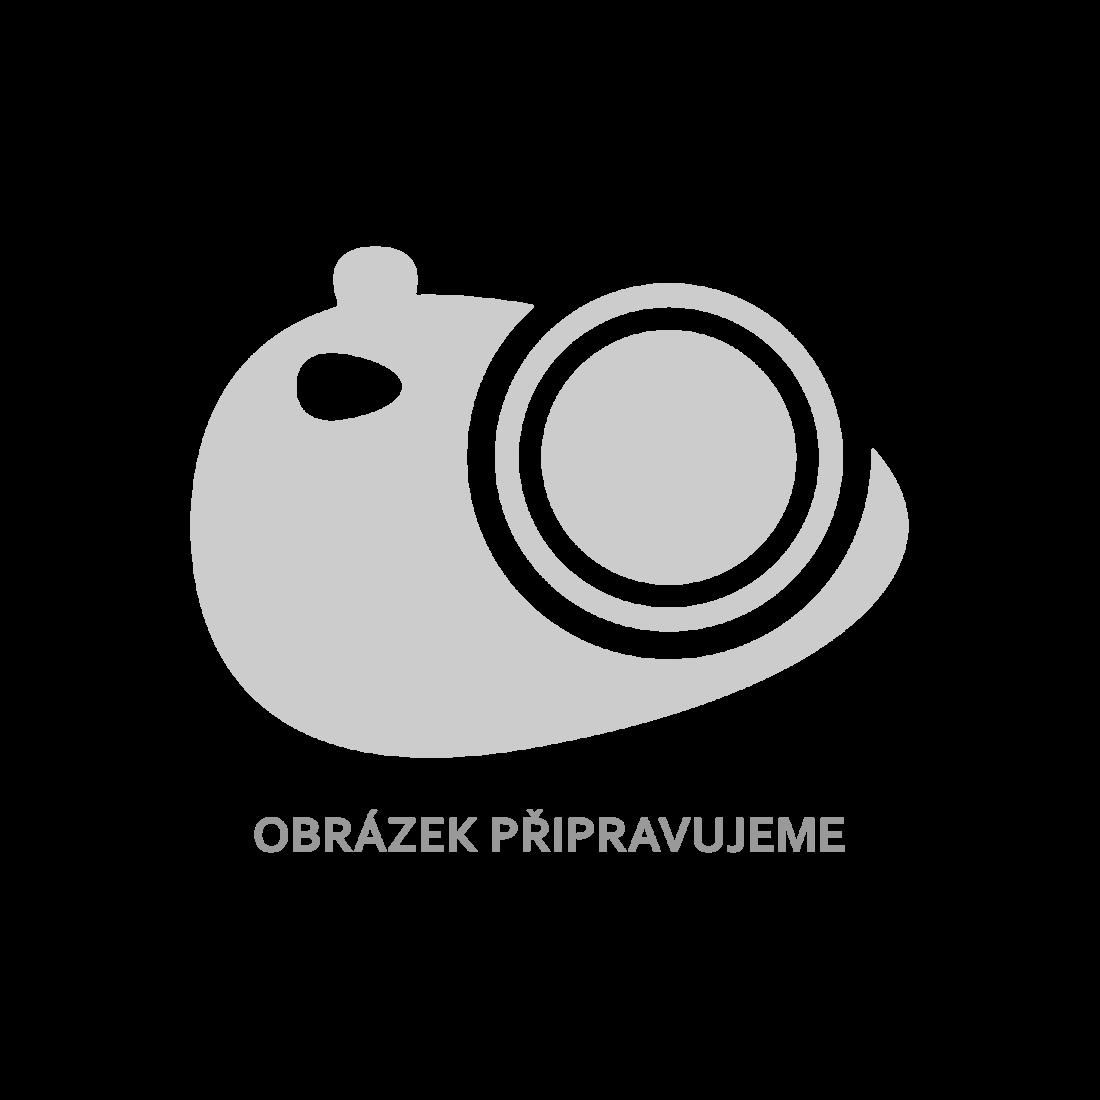 vidaXL Noční stolek bílý a šedý 40 x 30 x 62 cm MDF [285771]